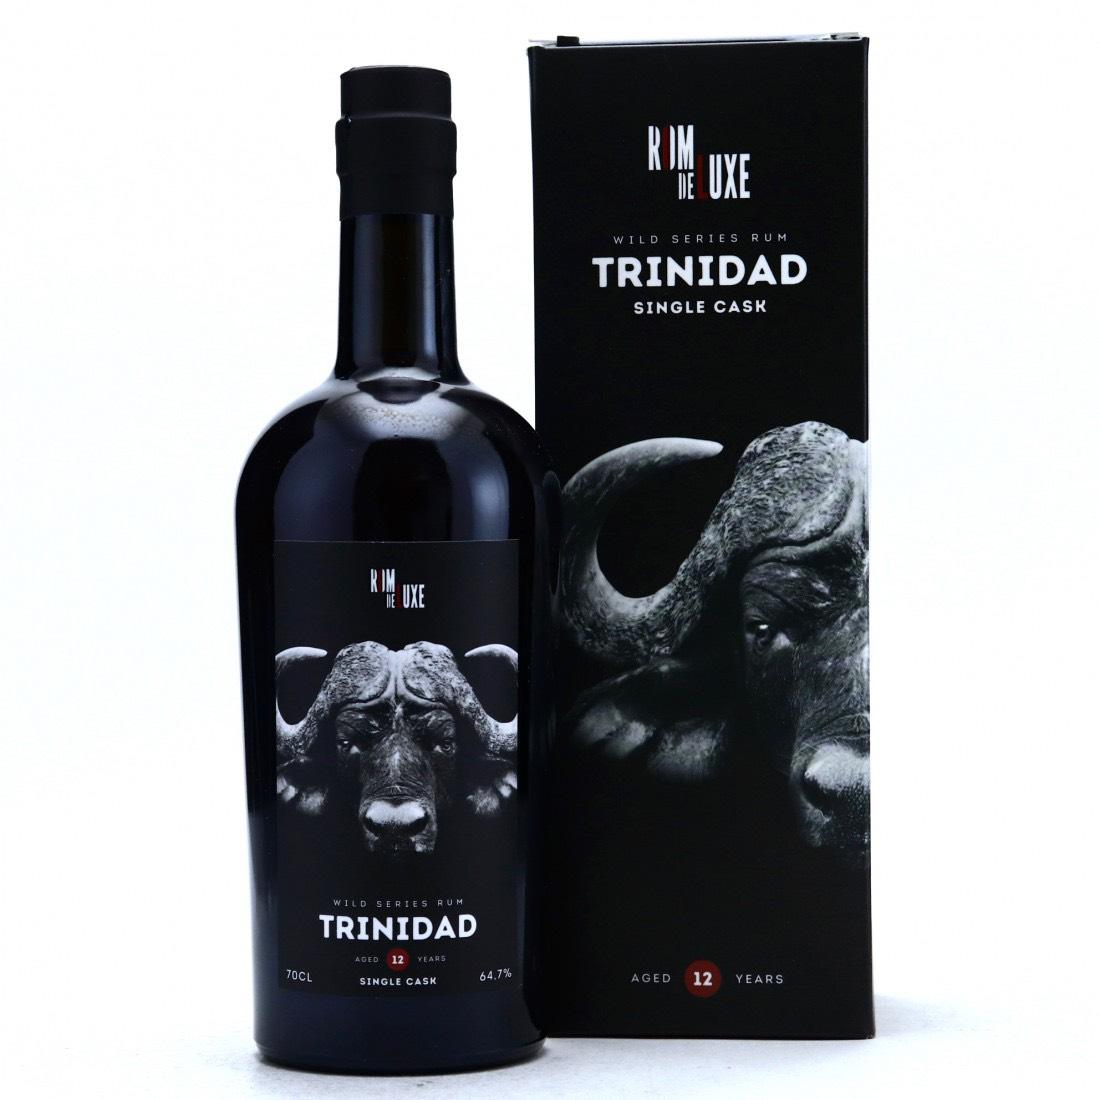 Bottle image of Wild Series Rum No. 14 Trinidad